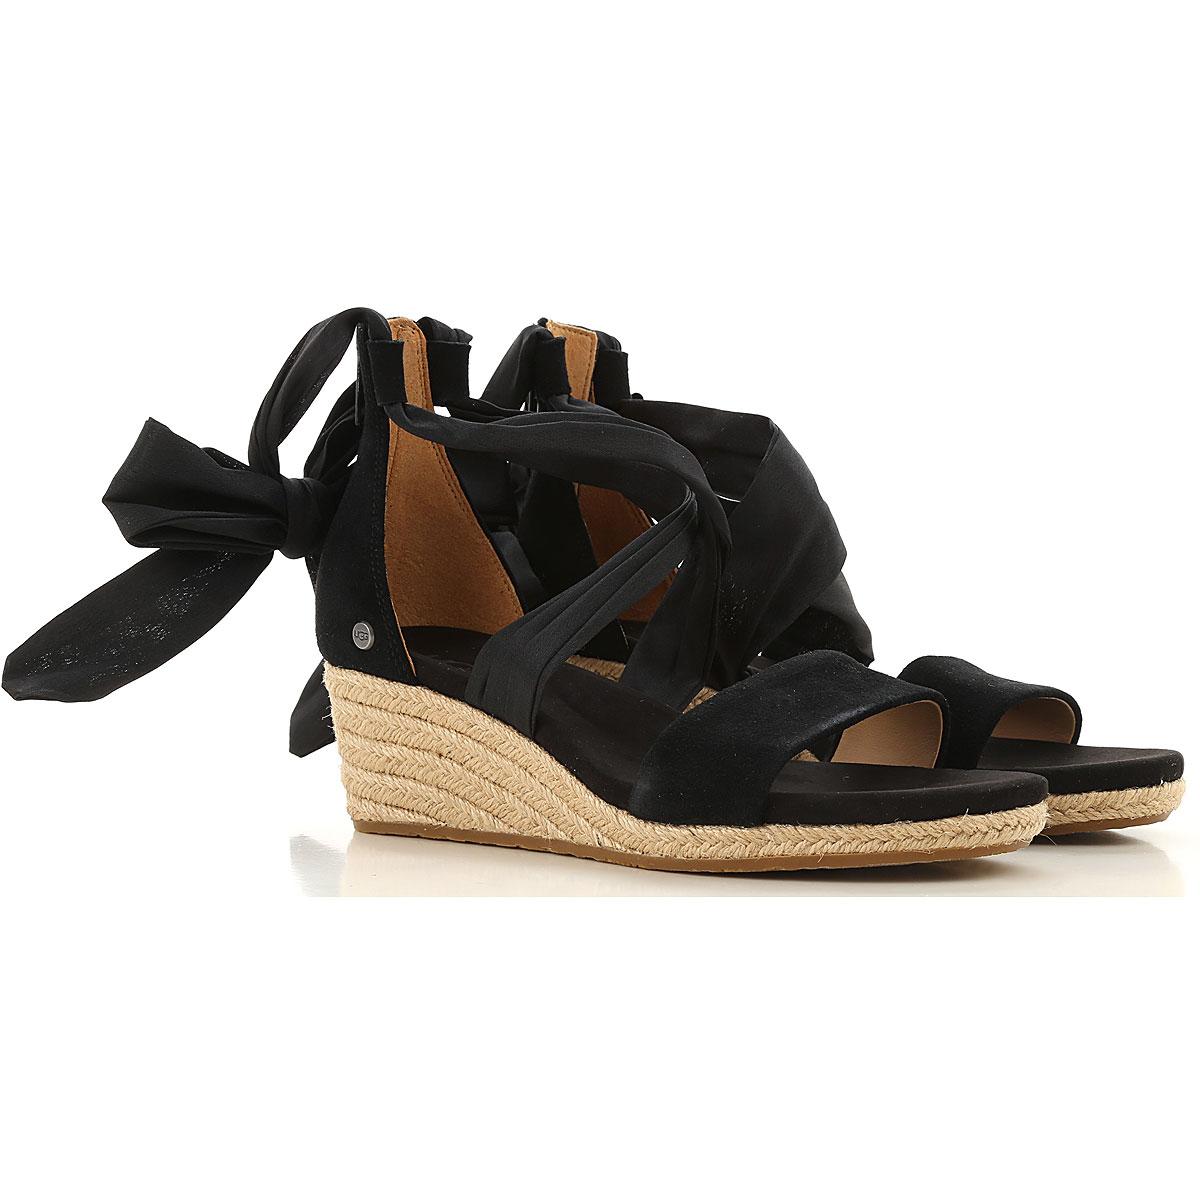 37c9066e9f3 Womens Shoes UGG, Style code: 1099693-trina-black